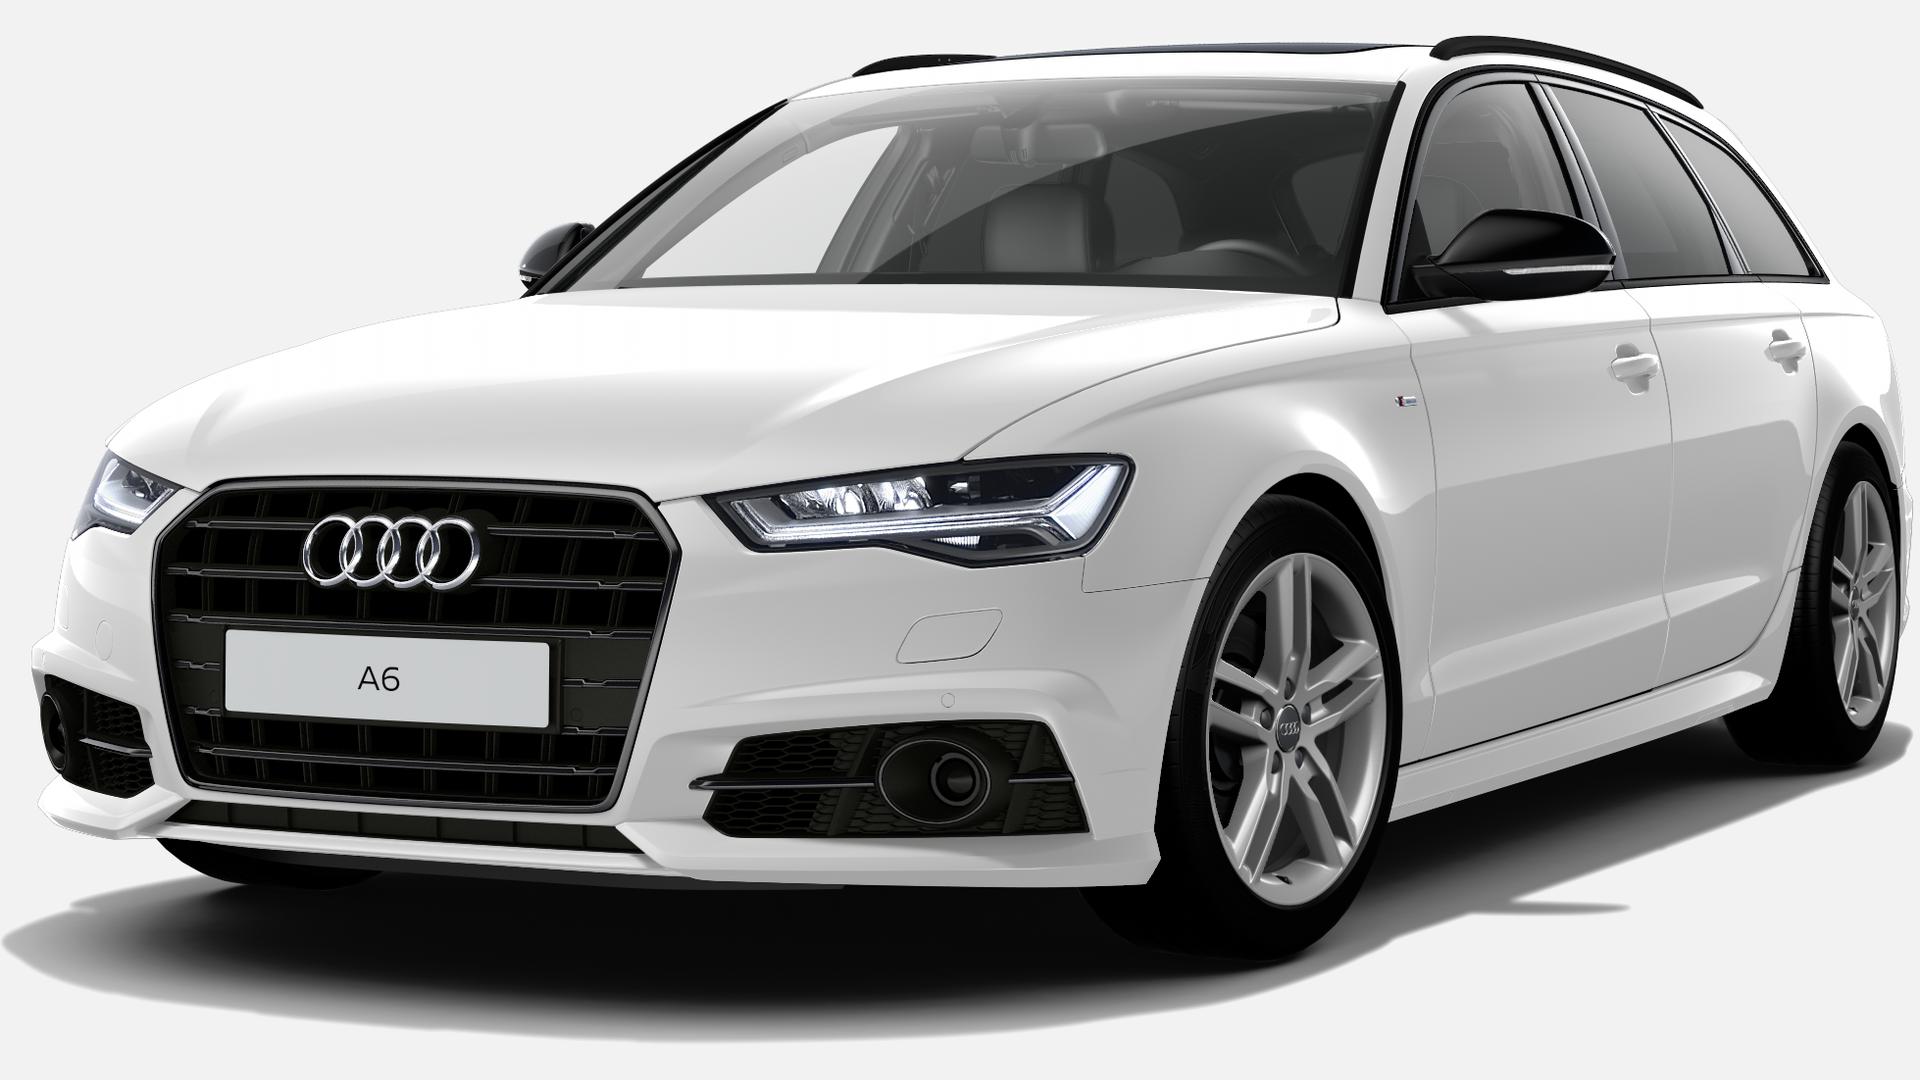 Audi A6 Avant 2.0 TDI Black line ultra S Tronic 140 kW (190 CV)  nuevo en Madrid